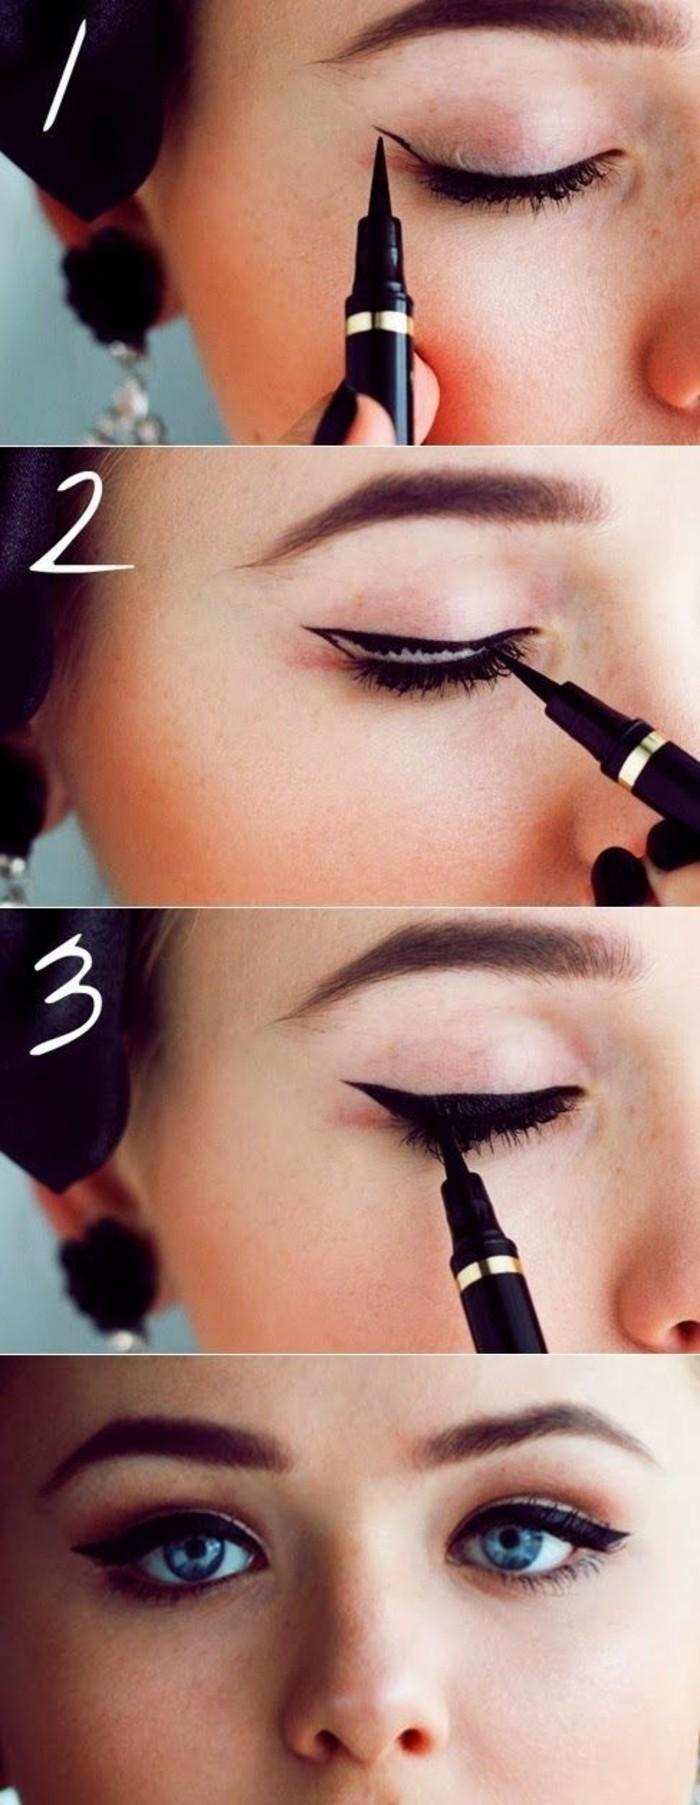 tuto-maquillage-yeux-bleus-apprendre-a-se-maquiller-facilement-eyeliner-noir